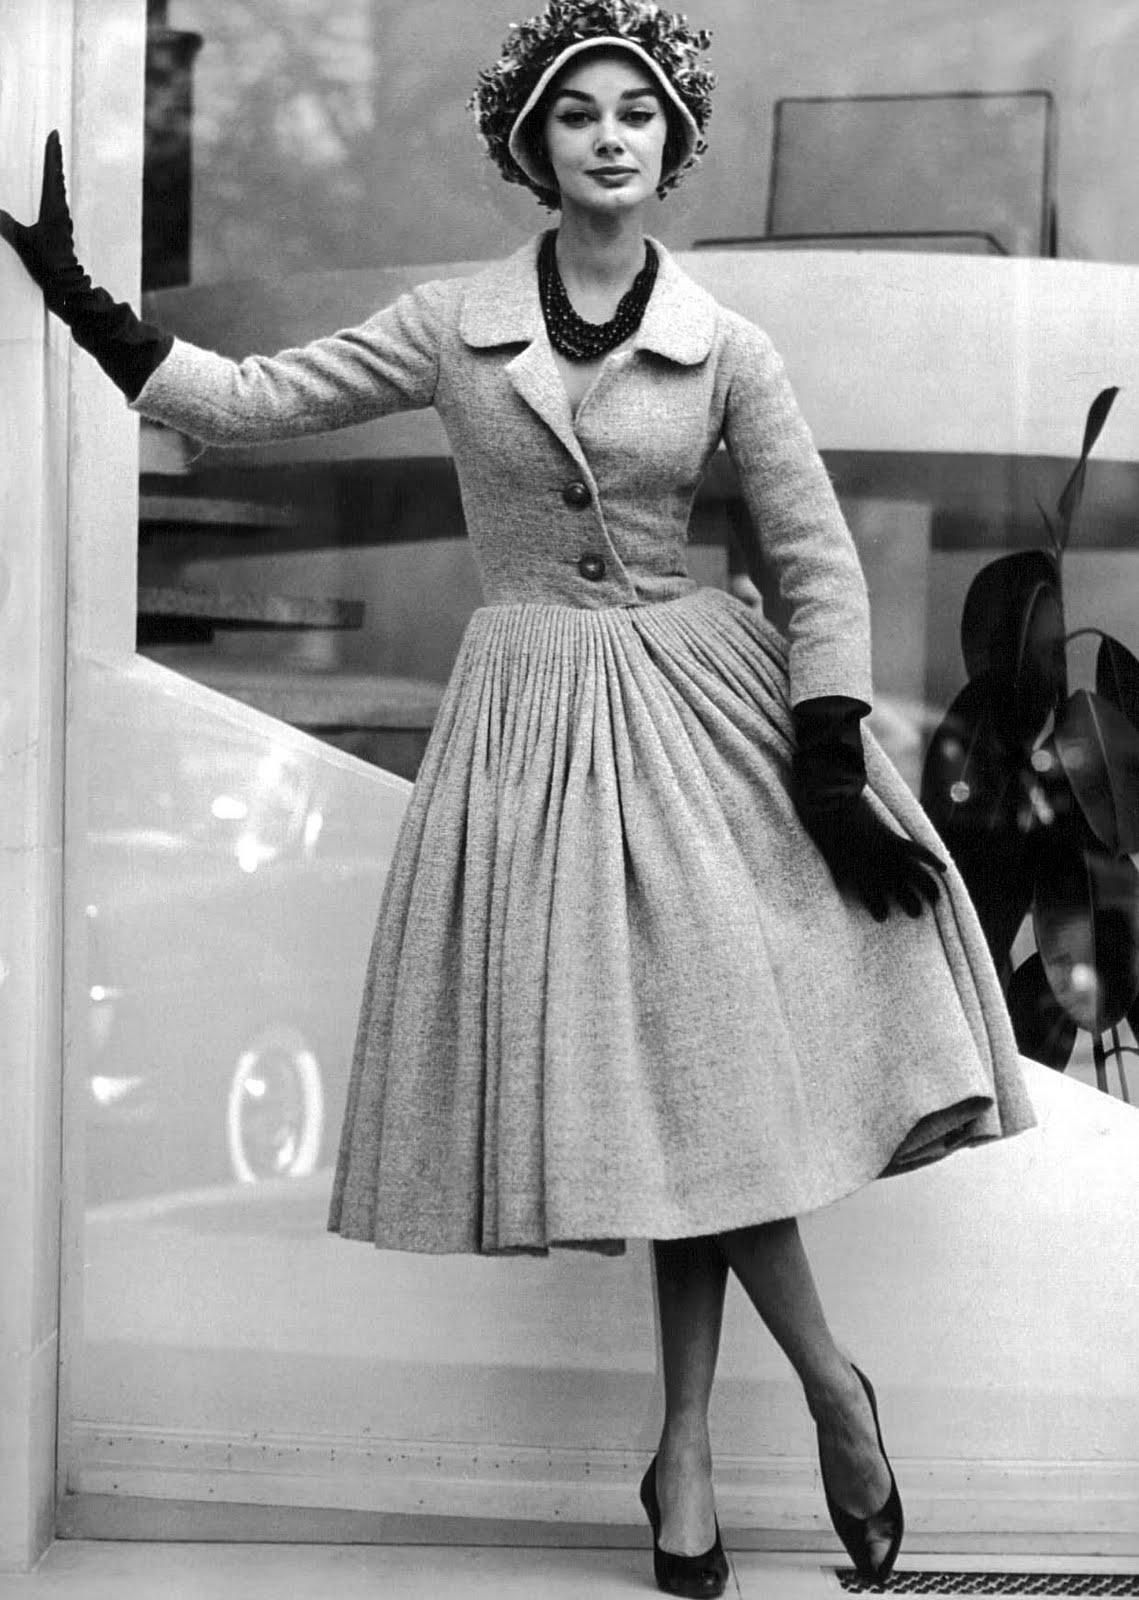 Spencer Alley Dior Amp Germany